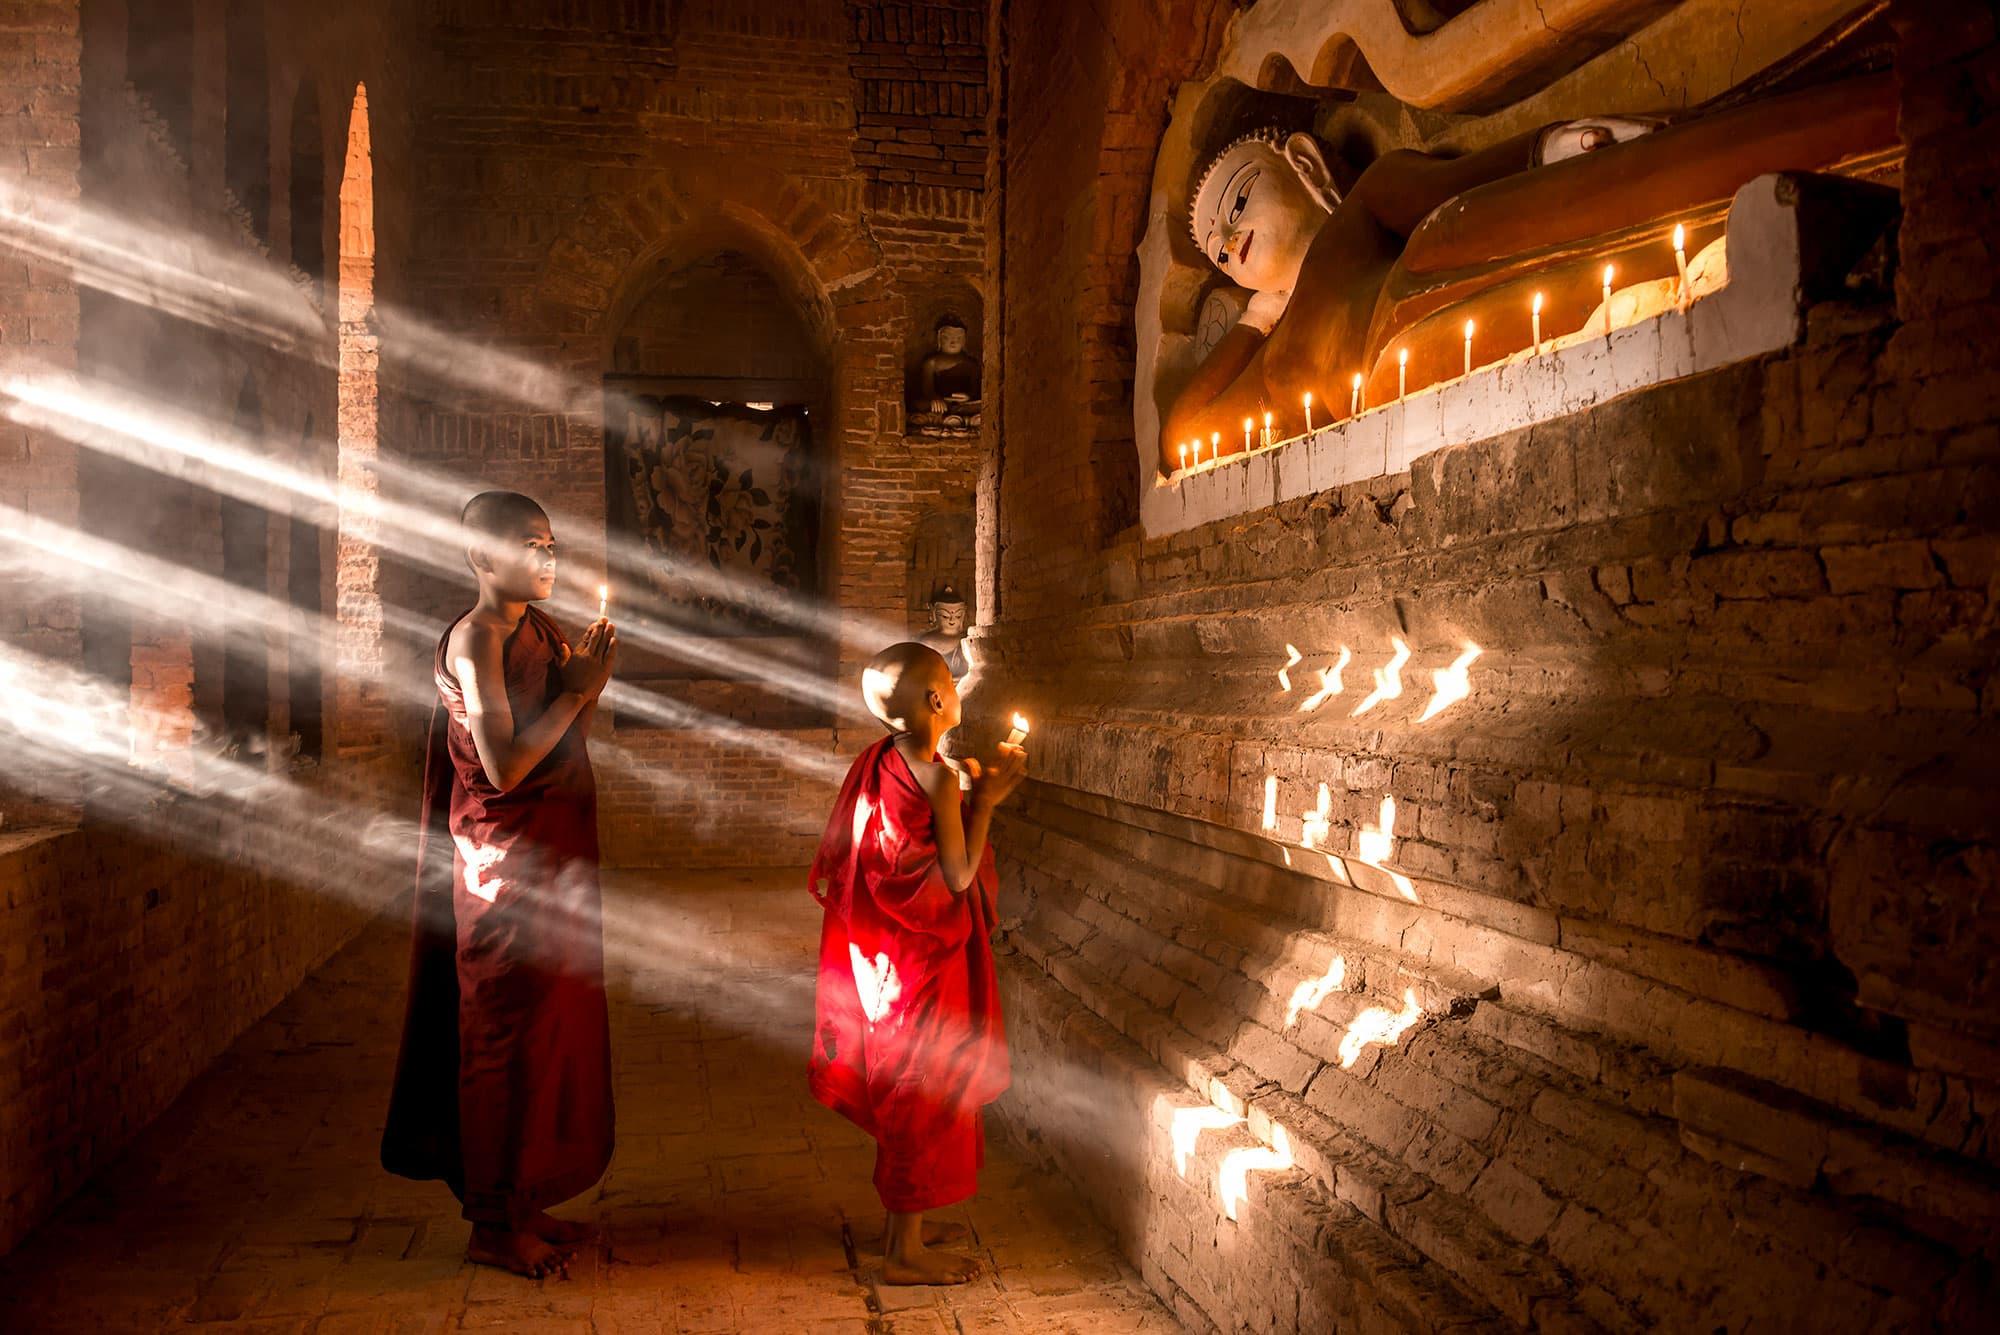 Myanmar espléndido, viaje de lujo - Myanmar- imagen #2